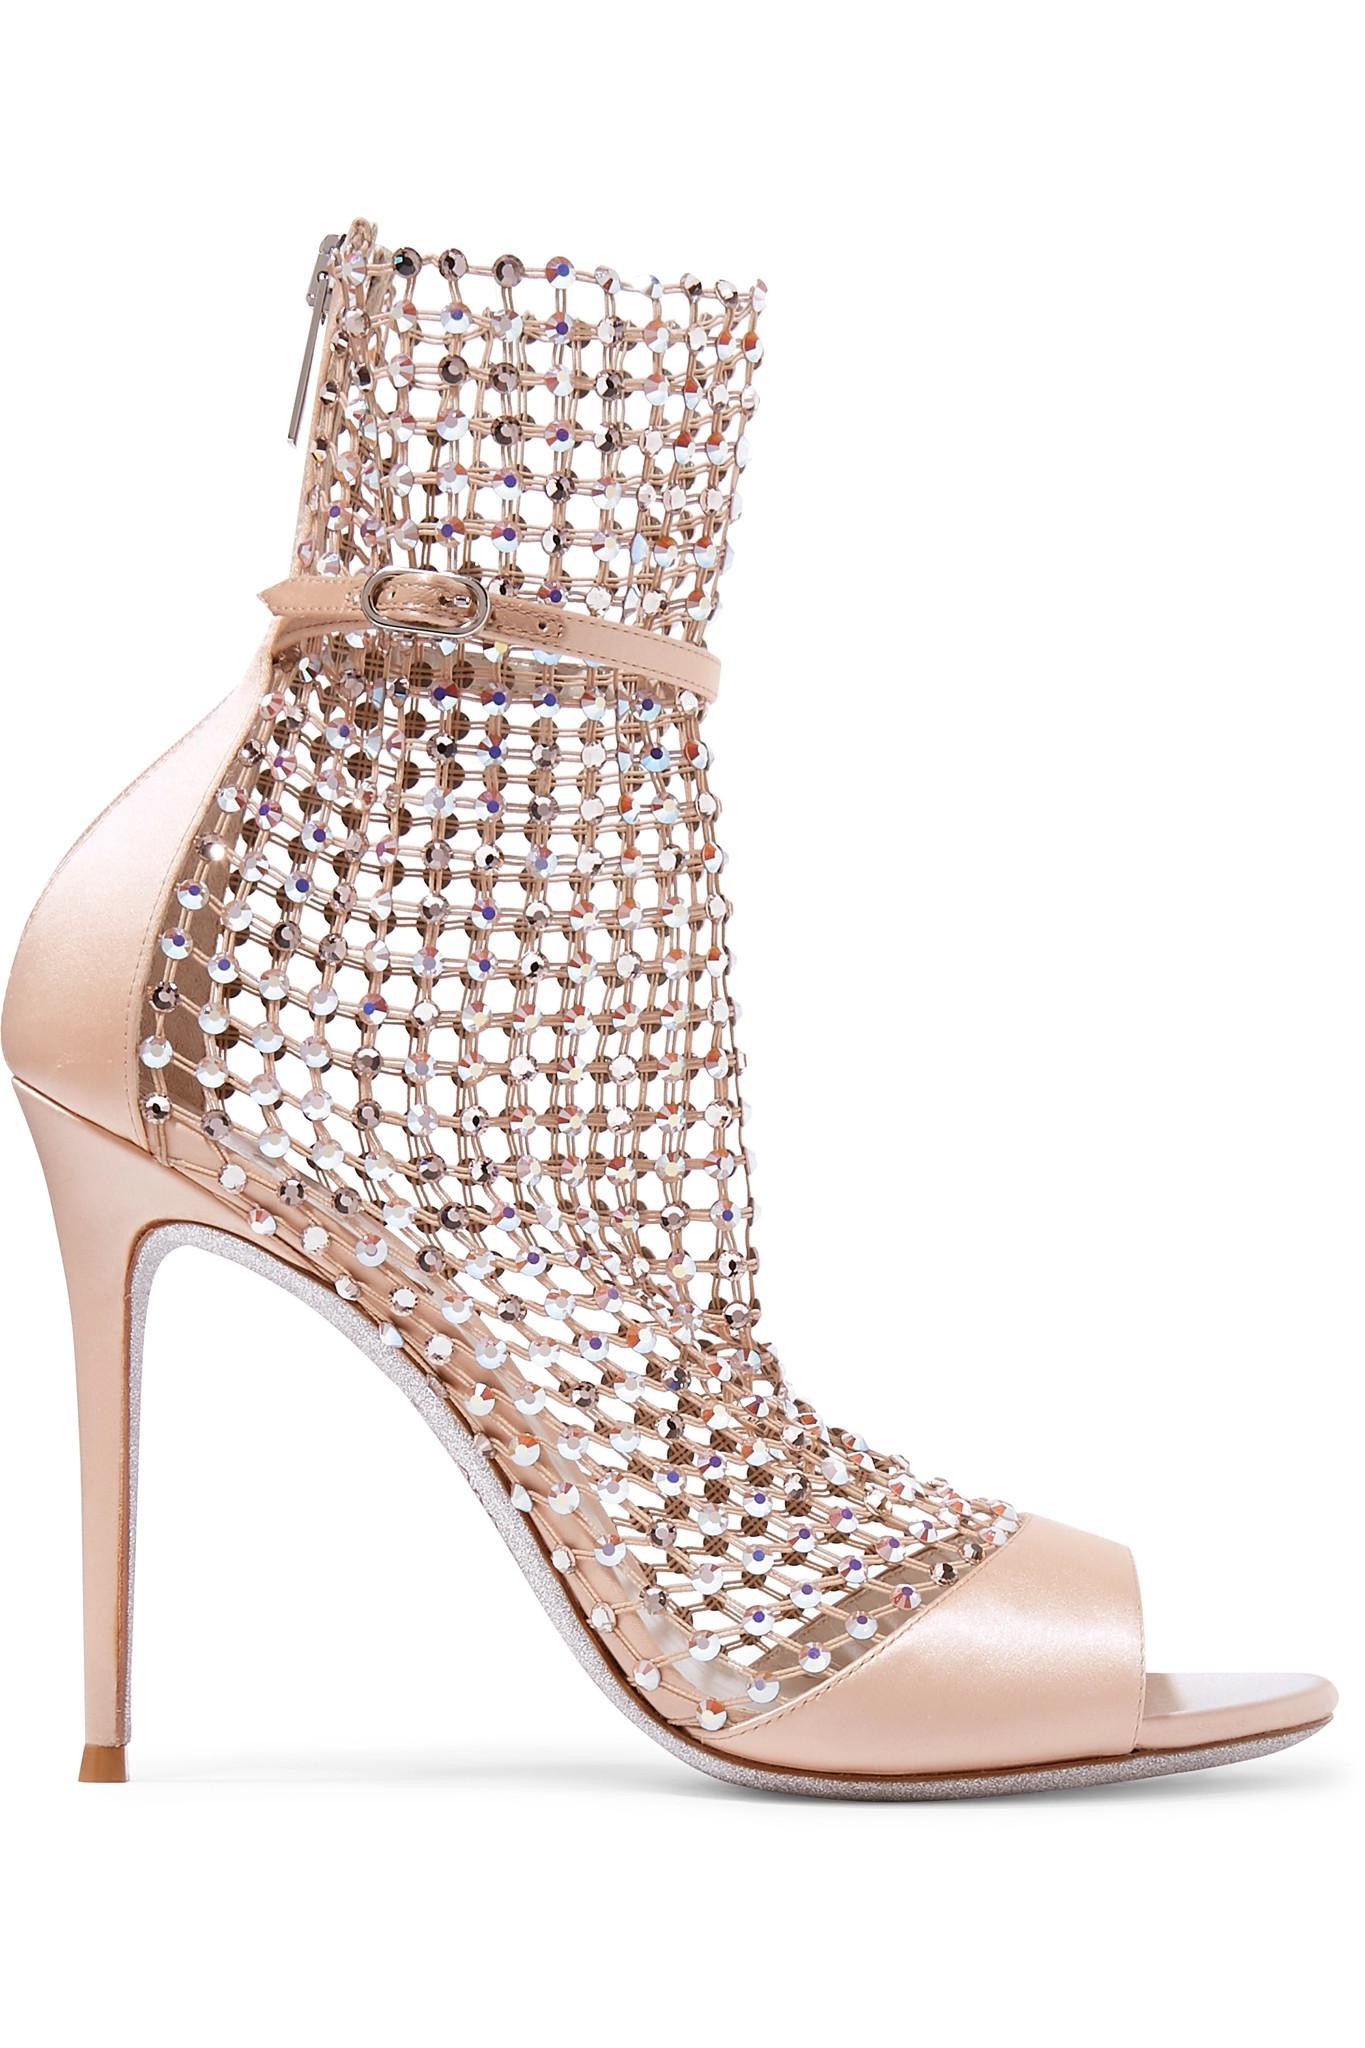 4d7ea0cb1 Lyst - Rene Caovilla Embellished Mesh Sandals in Pink